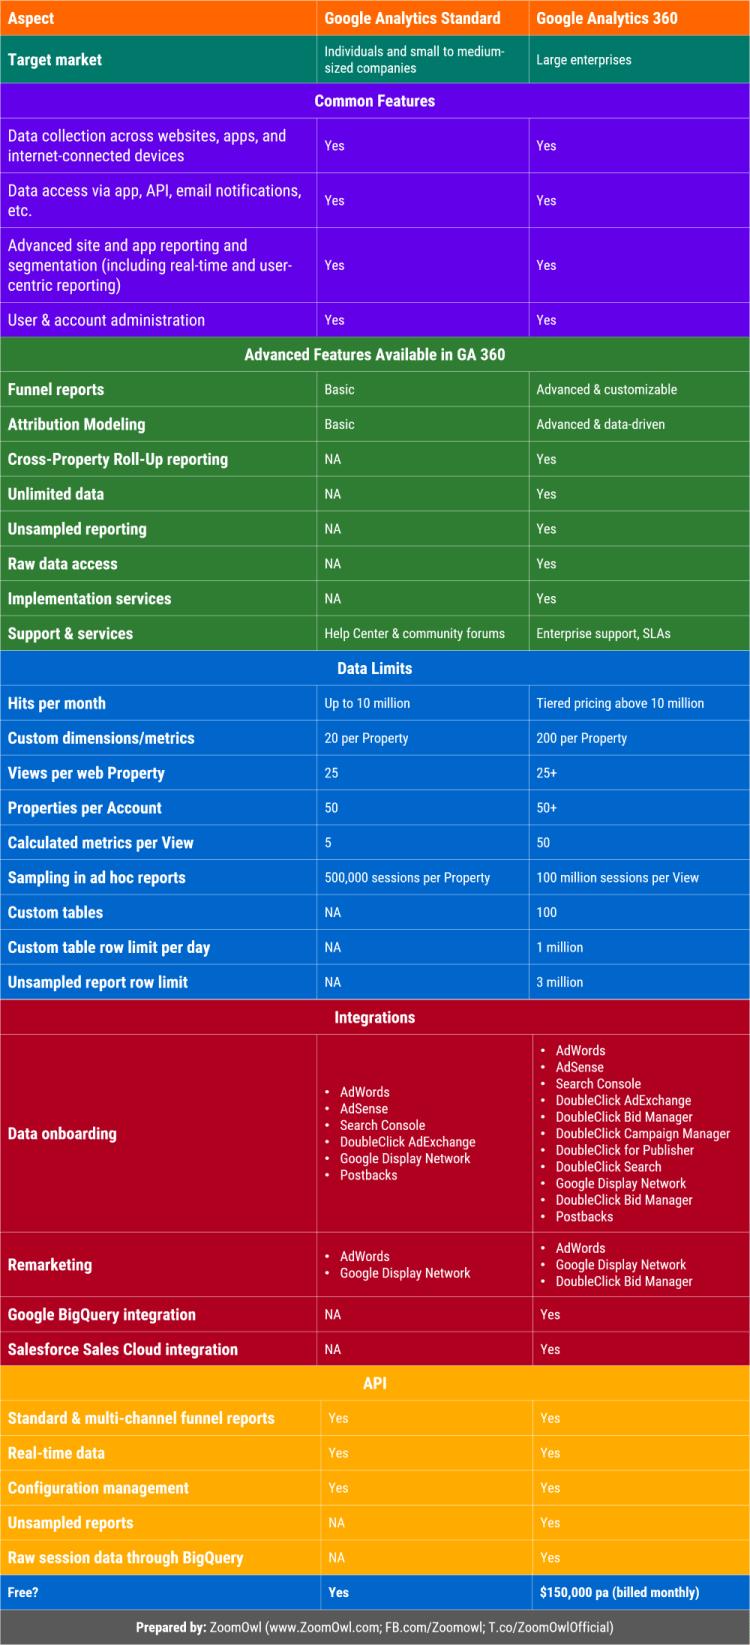 Image 1b.3. Google Analytics 360 Suite vs. Google Analytics Standard